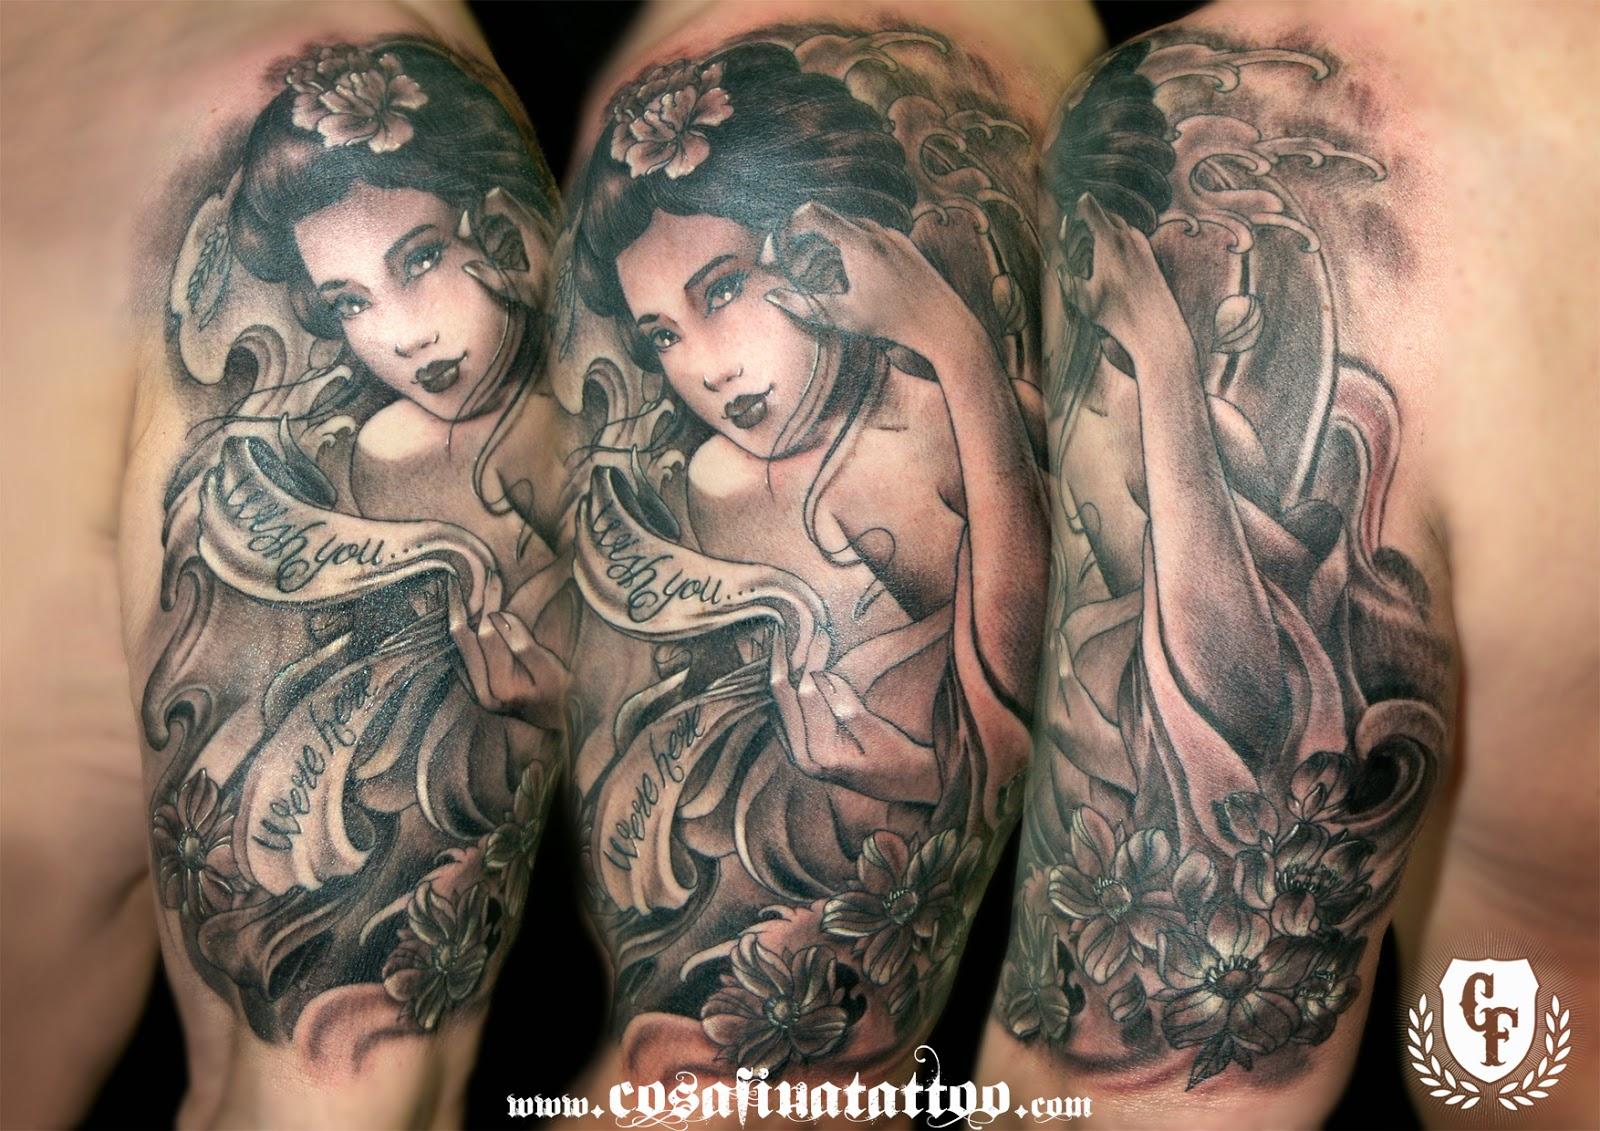 Cosafina tattoo carlos art studio tatuaje geisha flores - Tattoos geishas japonesas ...